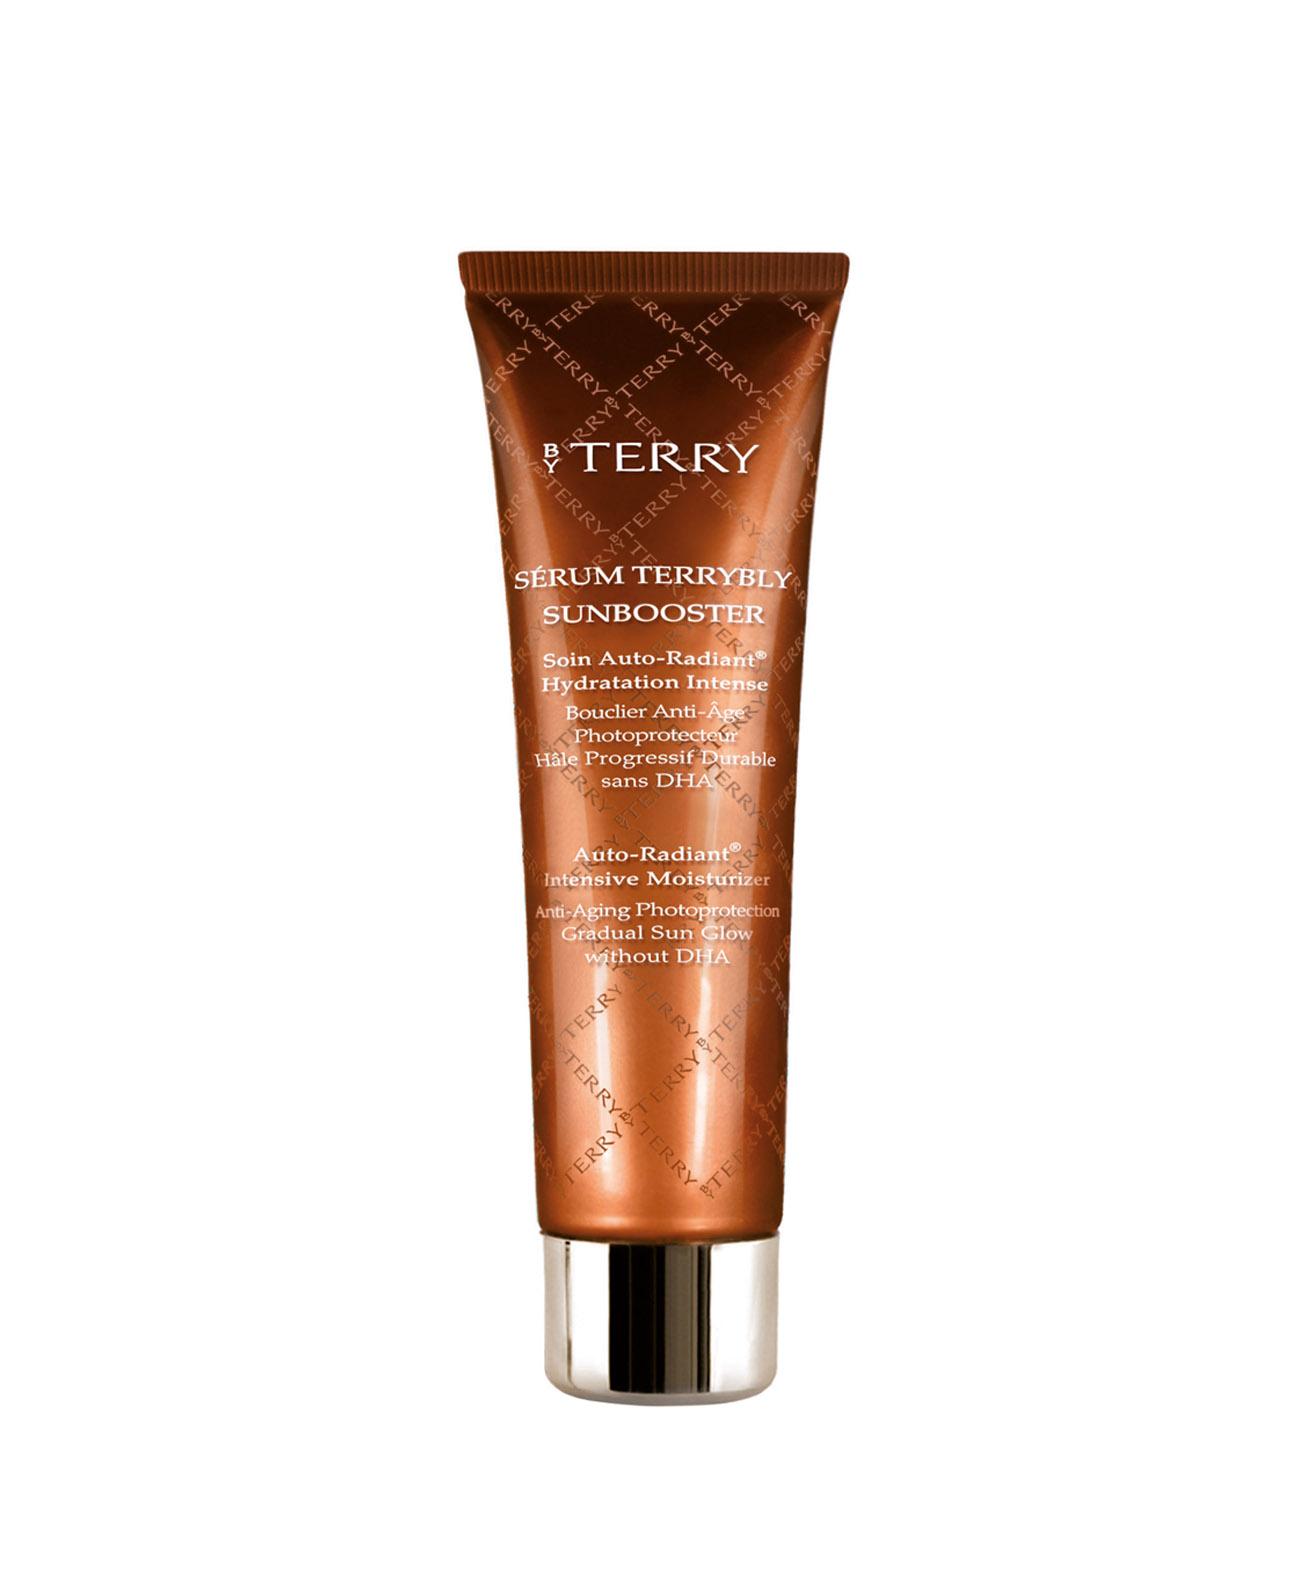 3-Serum-Terrybly-Sunbooster-siero-idratante-intenso-auto-abbronzante-Linea-makeup-di-nicchia-By-Terry-Dispar-SpA.jpg